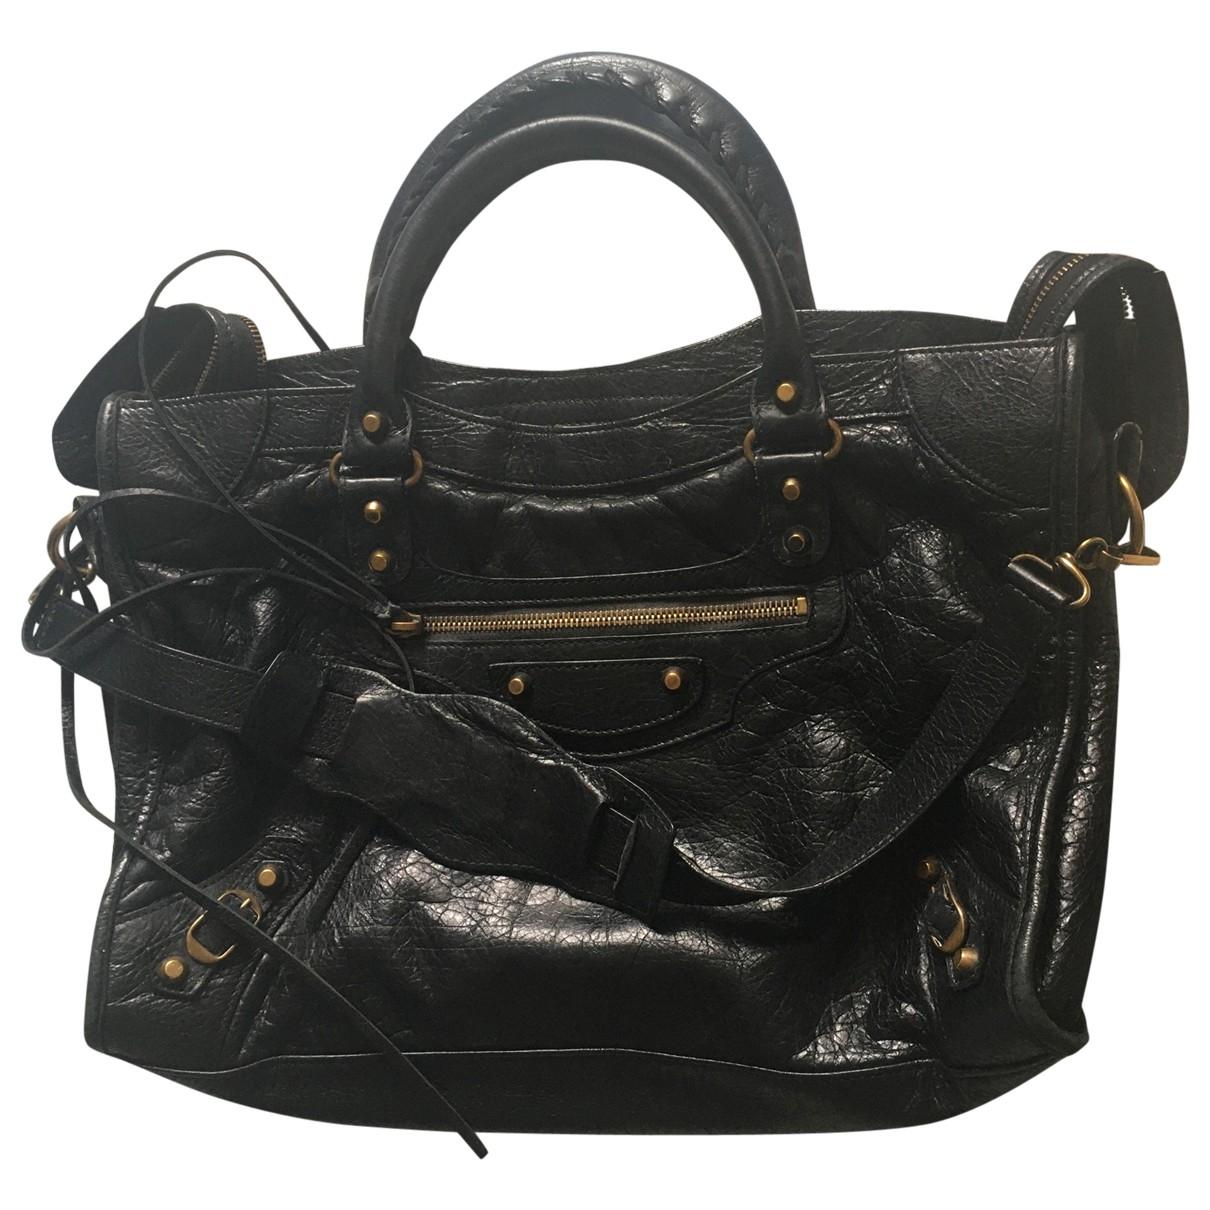 Balenciaga City Handtasche in  Schwarz Leder